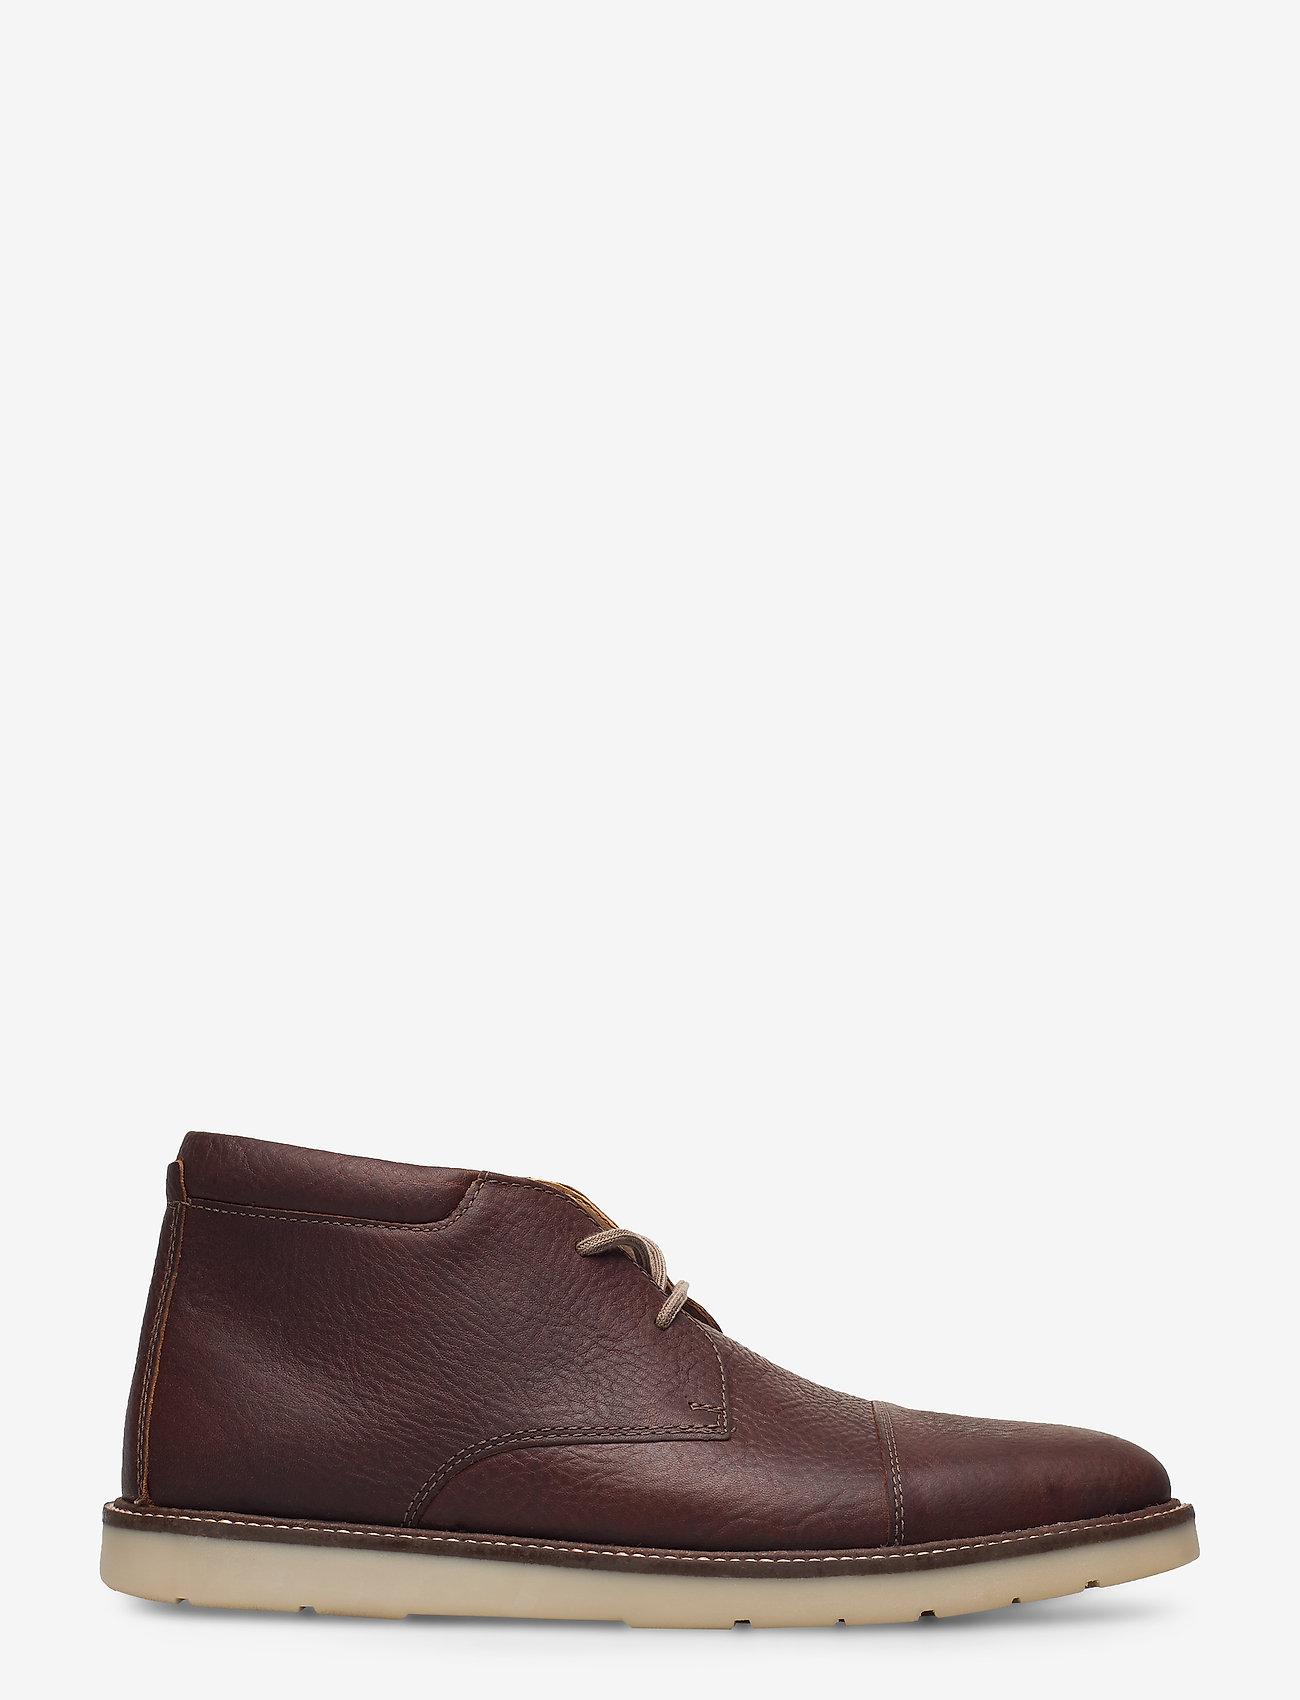 Clarks - Grandin Top - desert boots - tan tumbled - 1